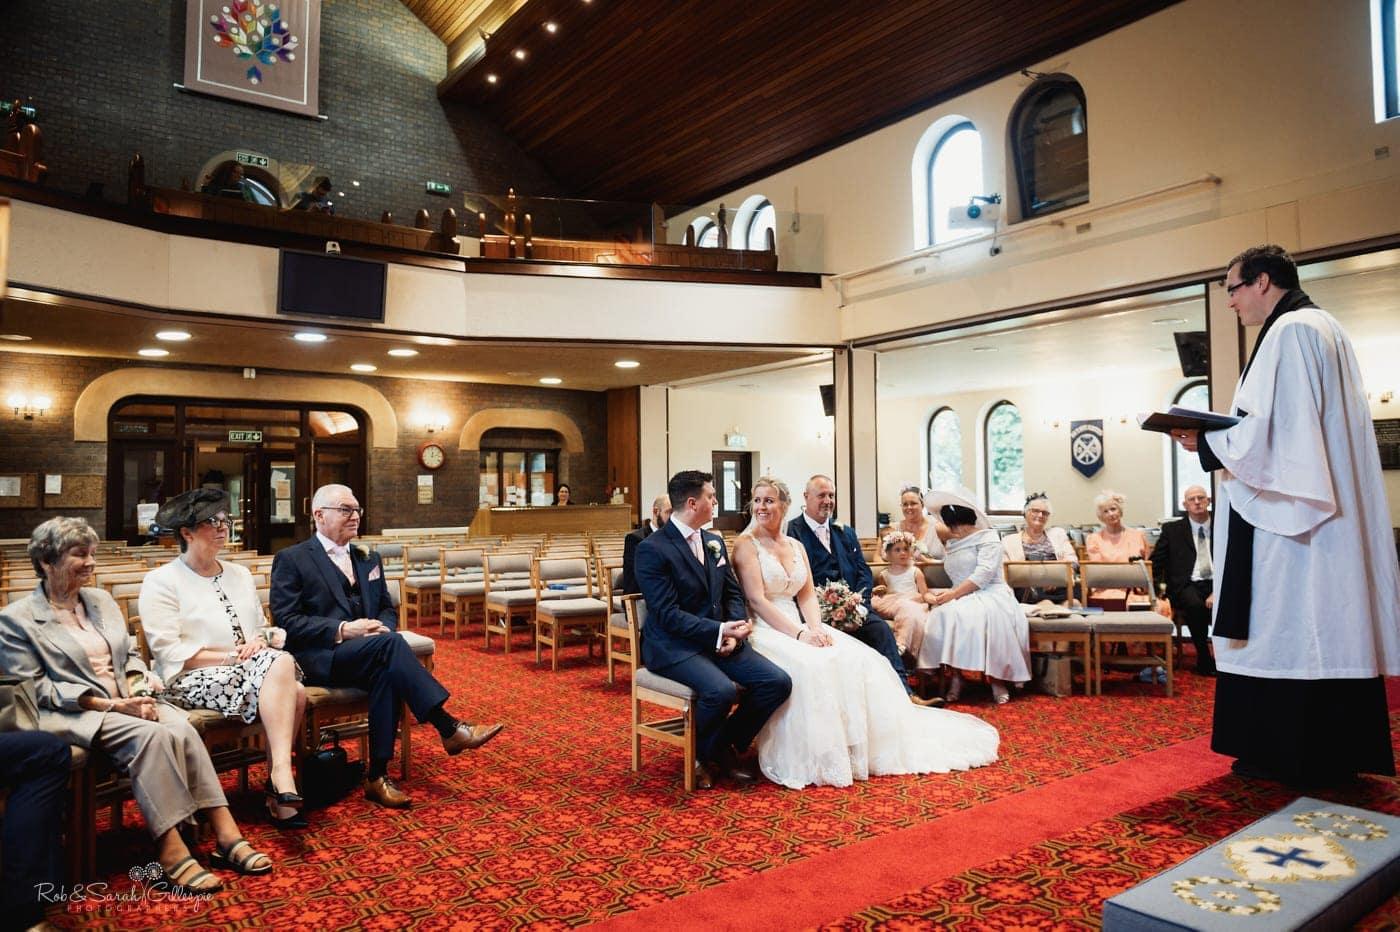 Small wedding service in church